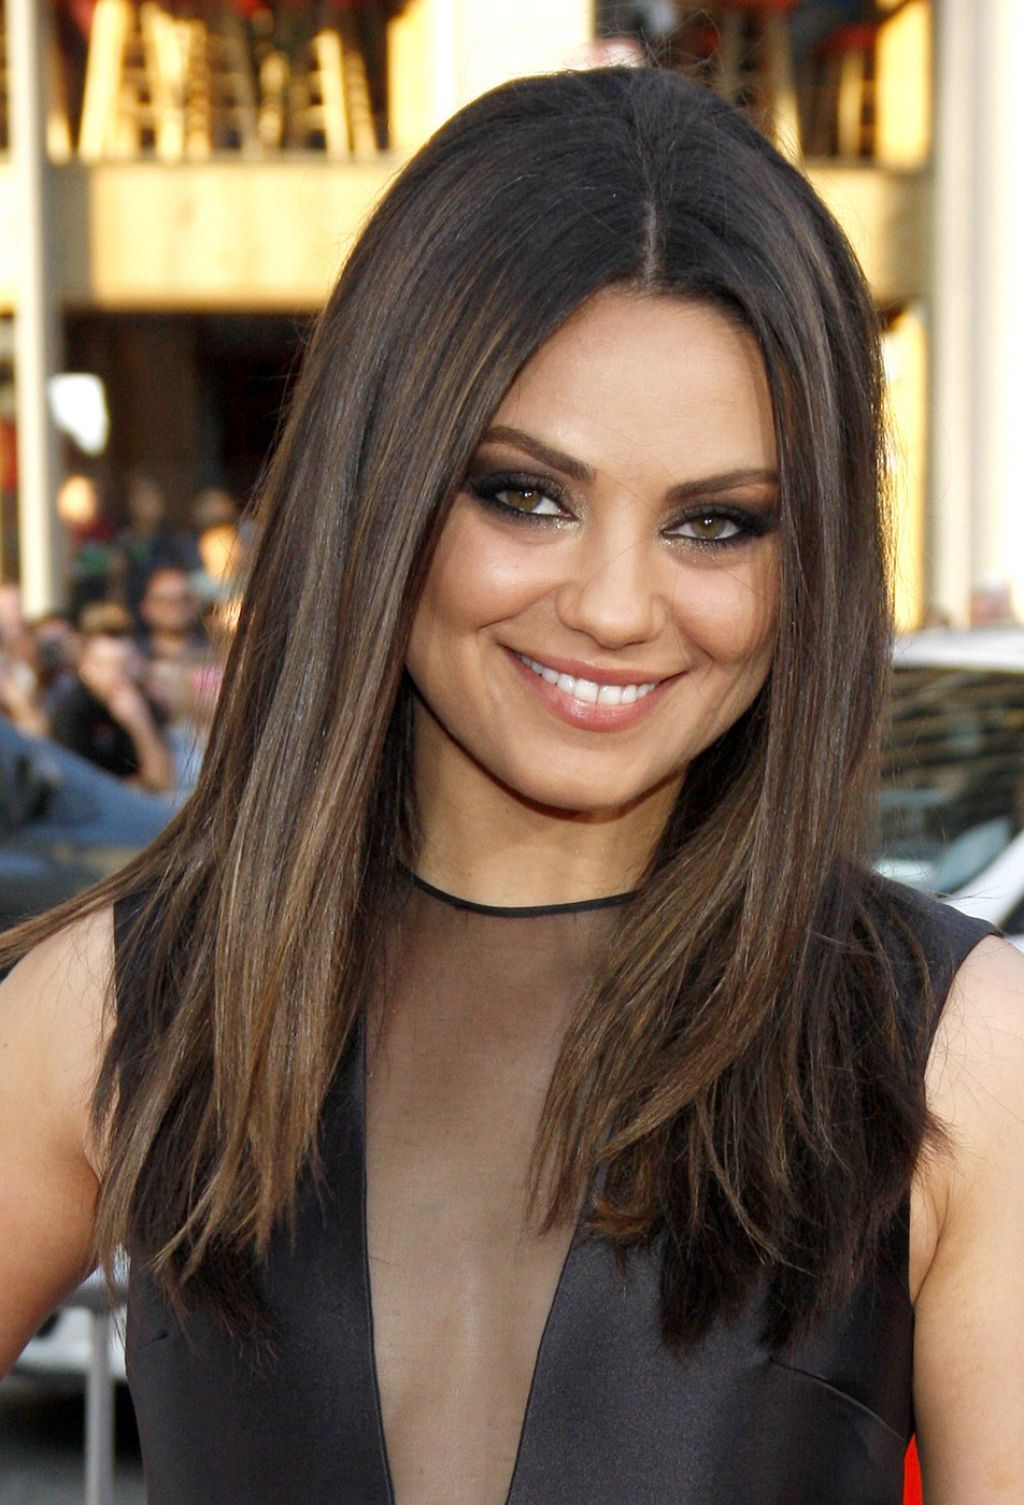 Mila Kunis Haircut Google Search Hair Pinterest